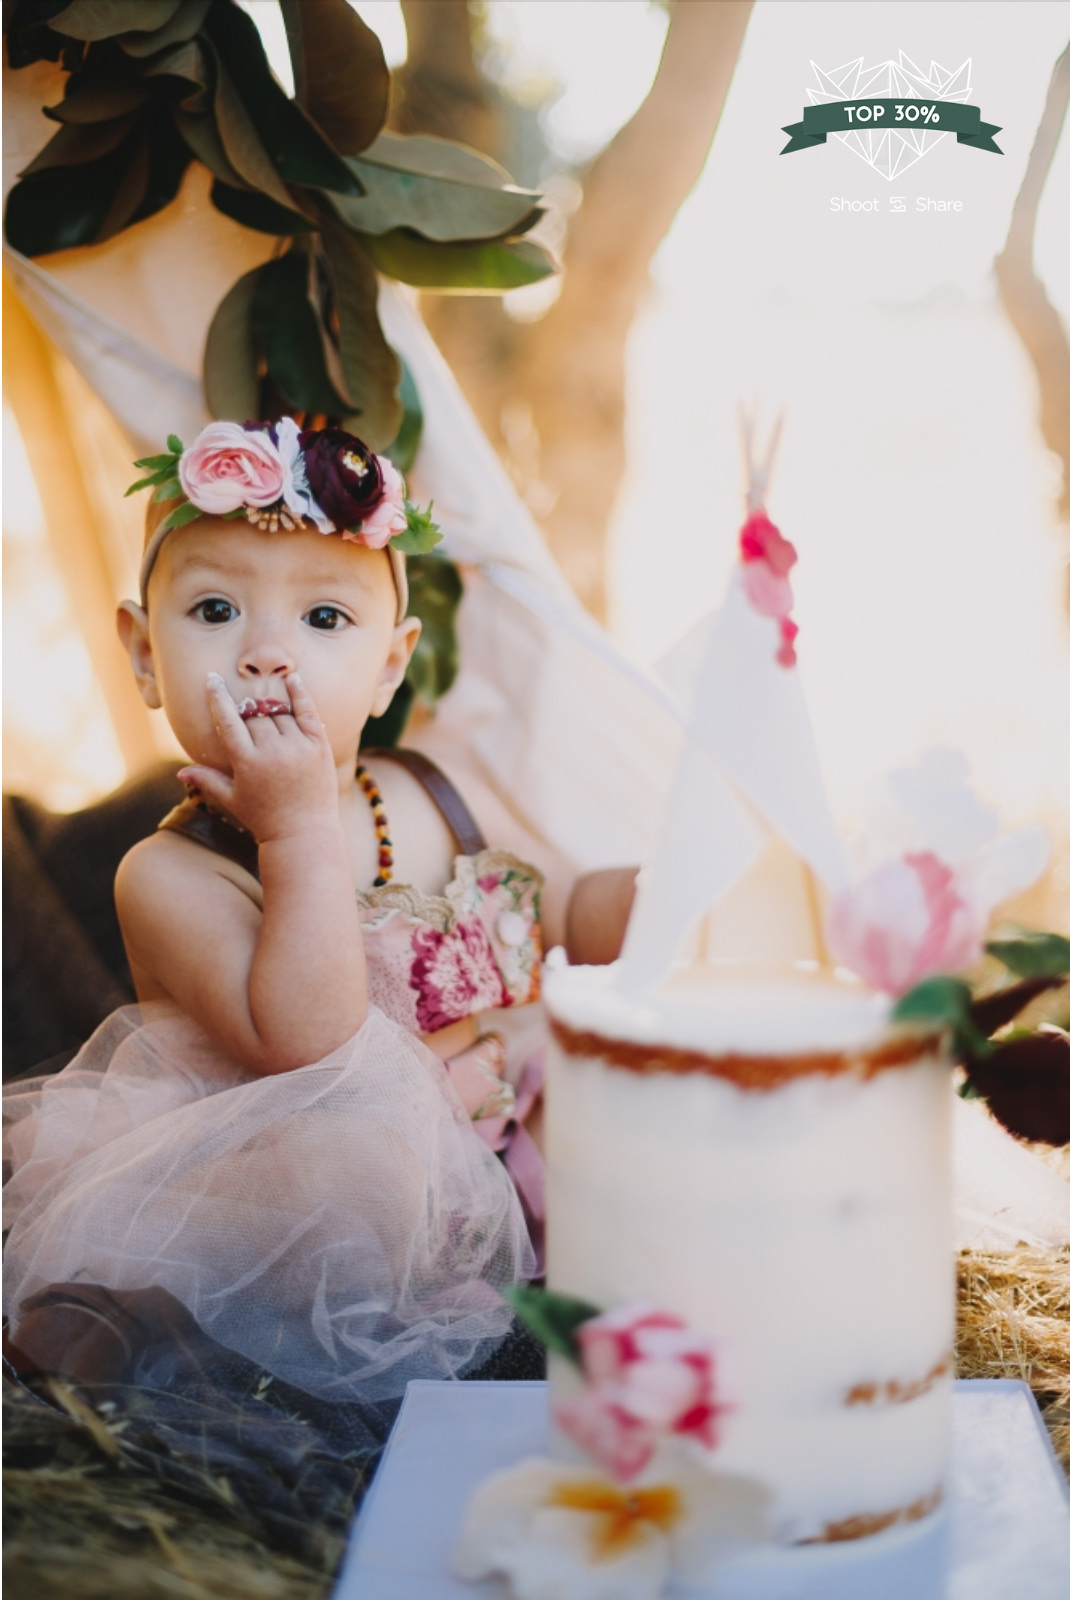 Archer Inspired Photography Shoot and Share Family Wedding Lifestyle Photographer Morgan Hill California San Francisco Bay Area-4.jpg